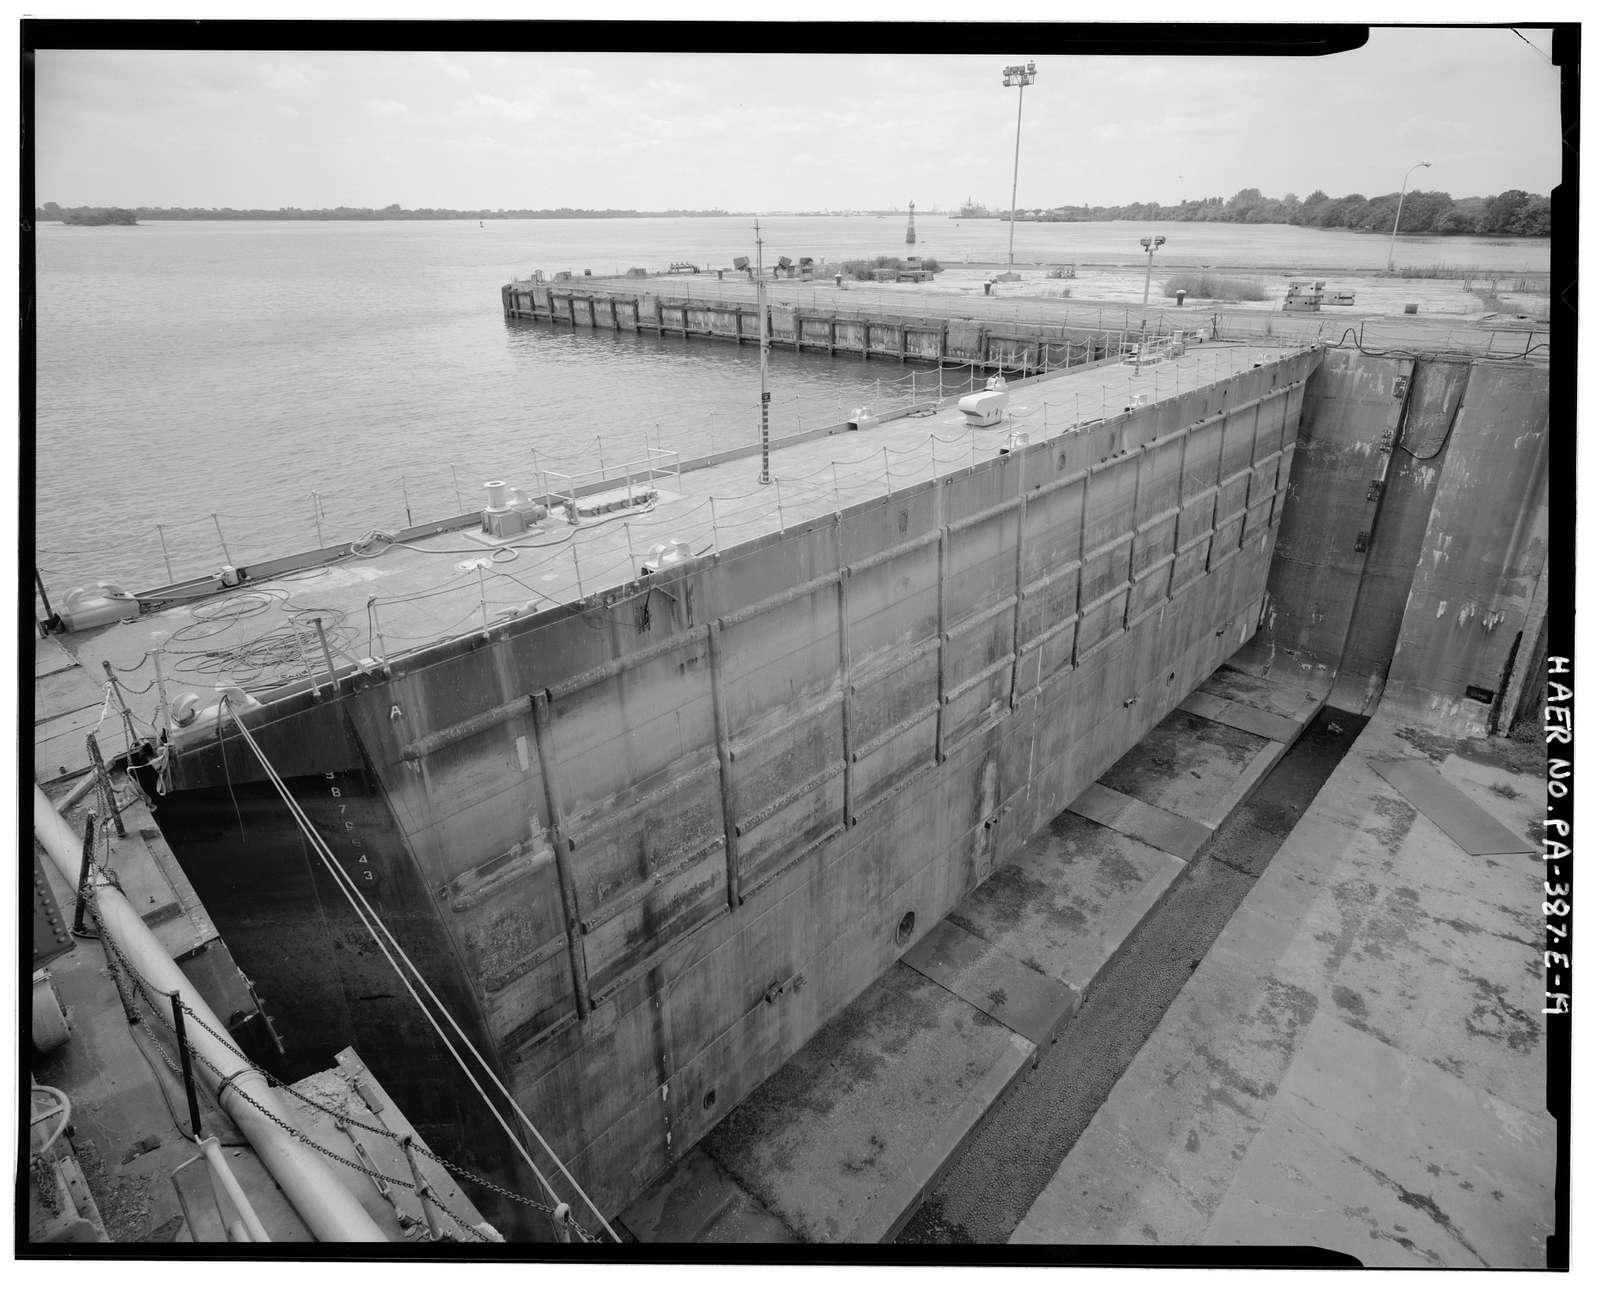 Naval Base Philadelphia-Philadelphia Naval Shipyard, Dry Dock No. 5, League Island, Philadelphia, Philadelphia County, PA